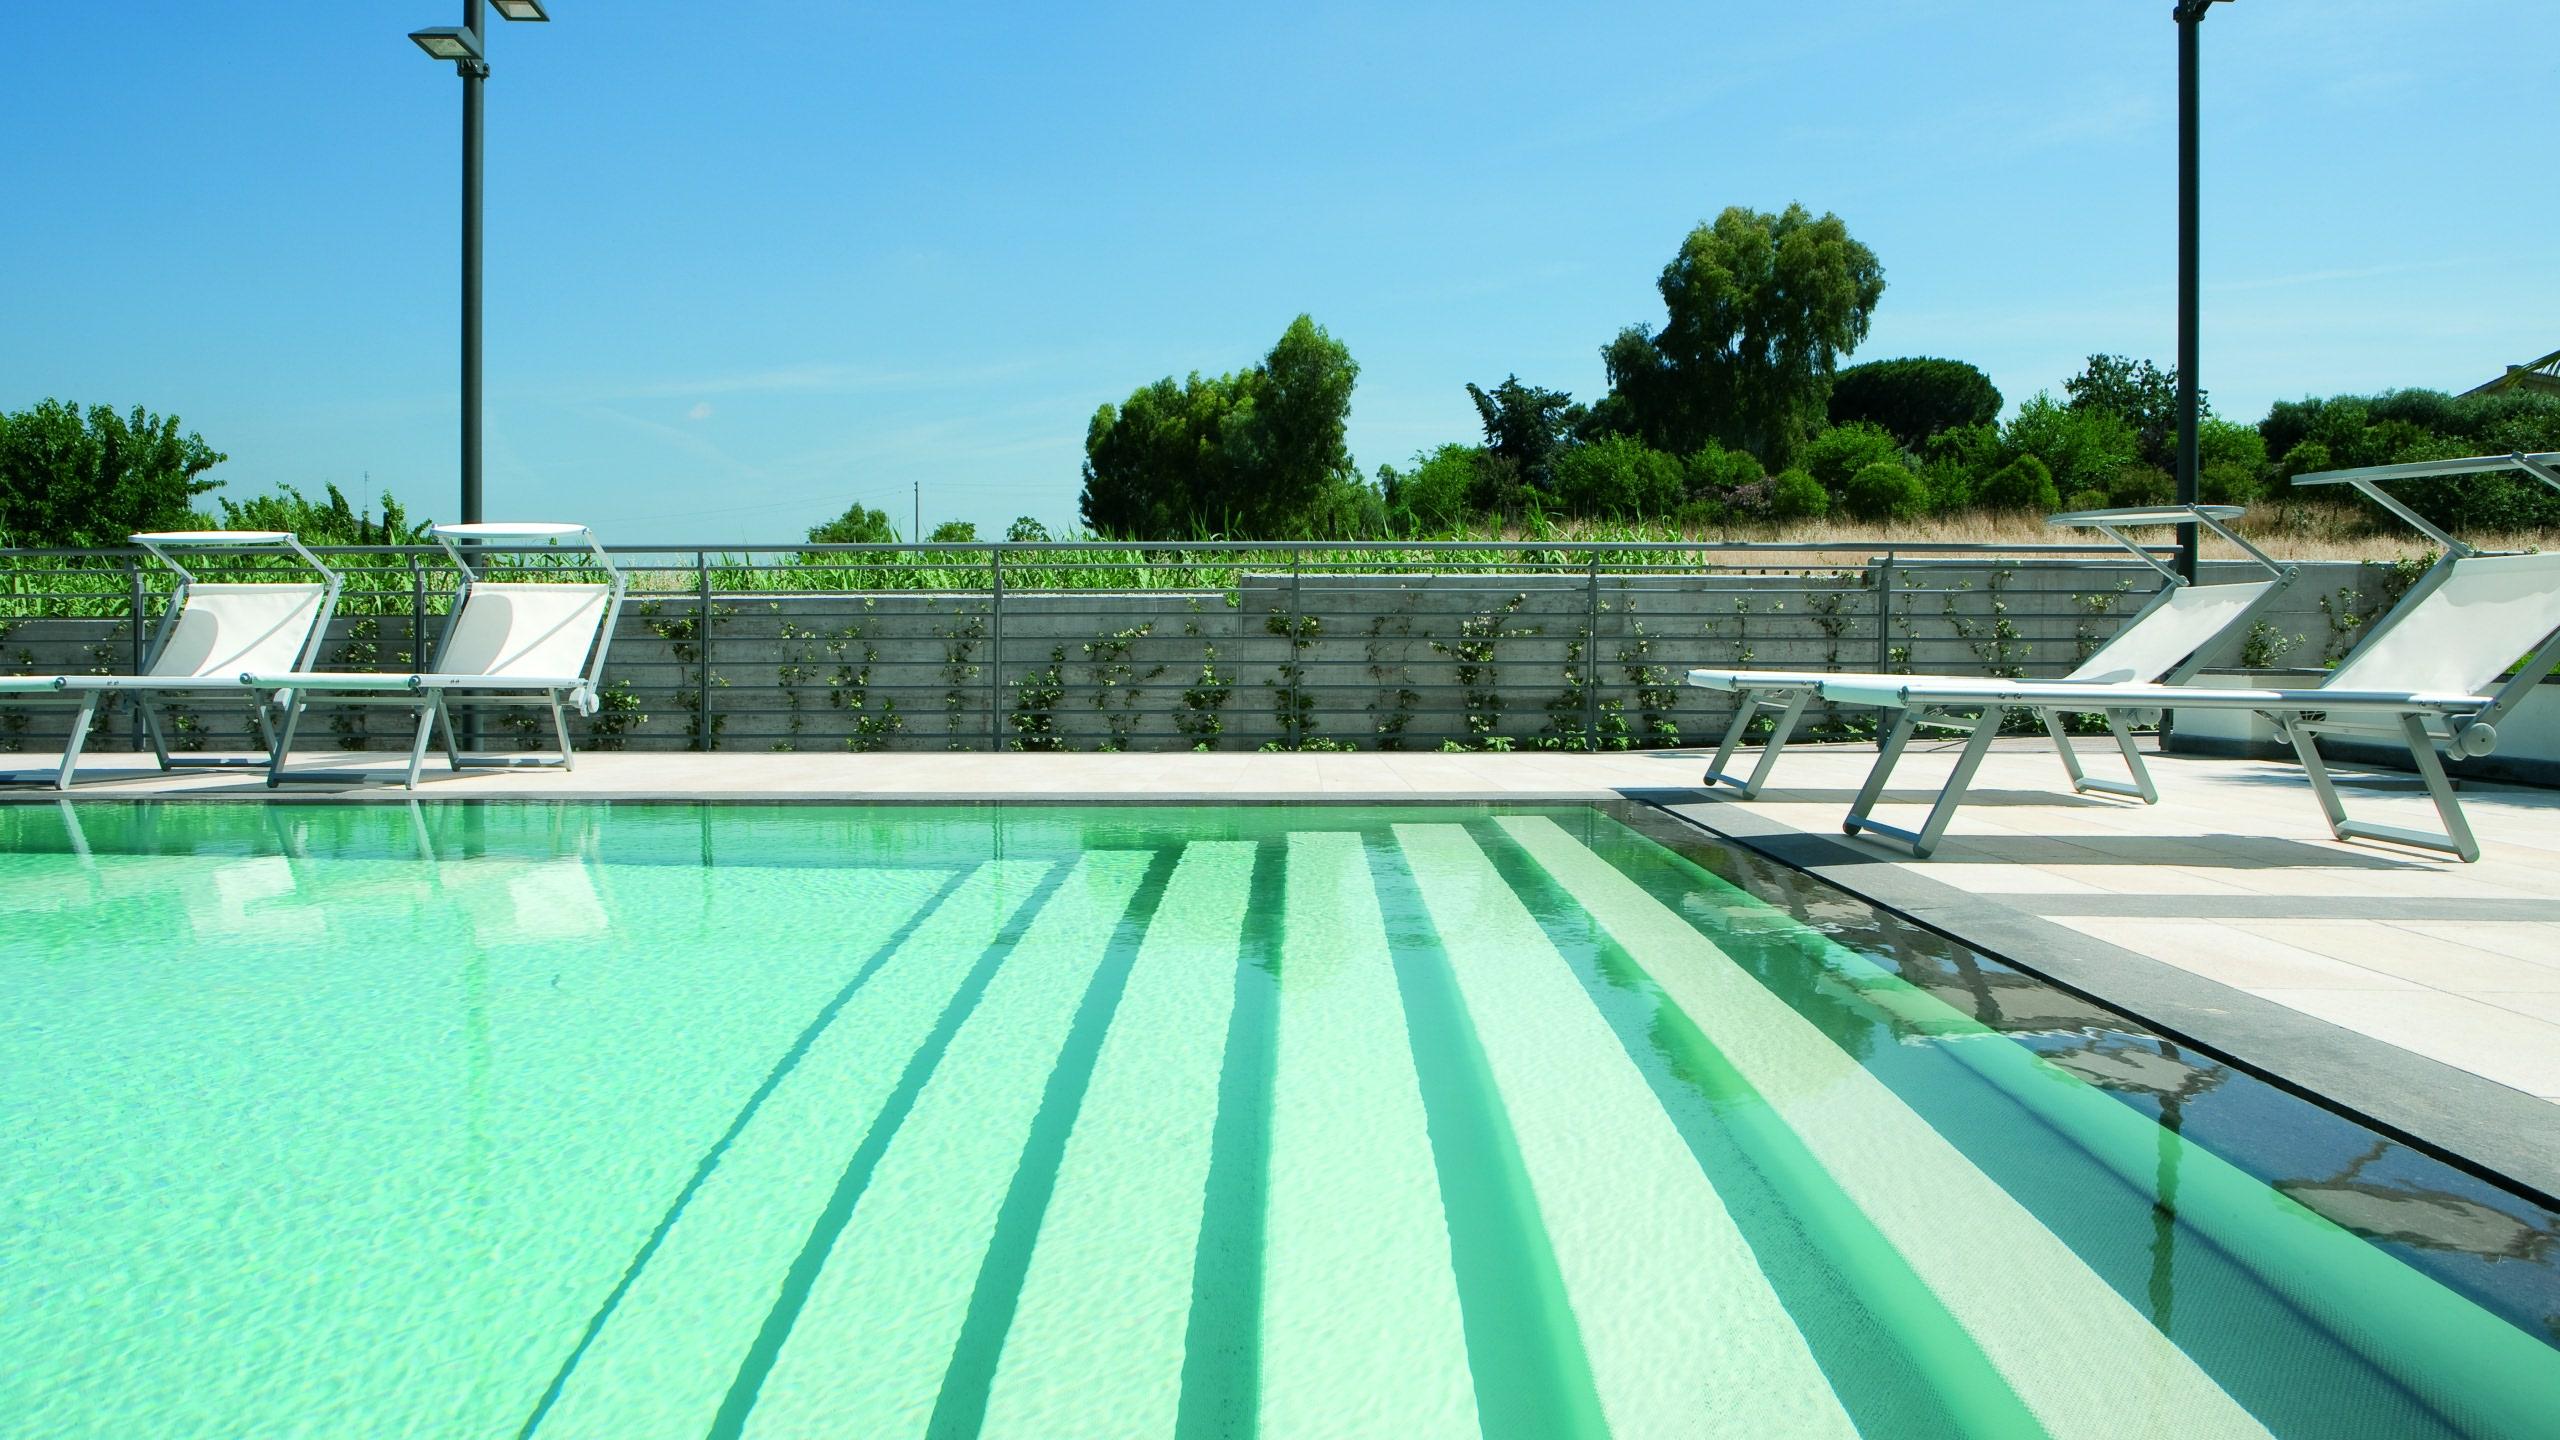 Hotel Appia Park Rome